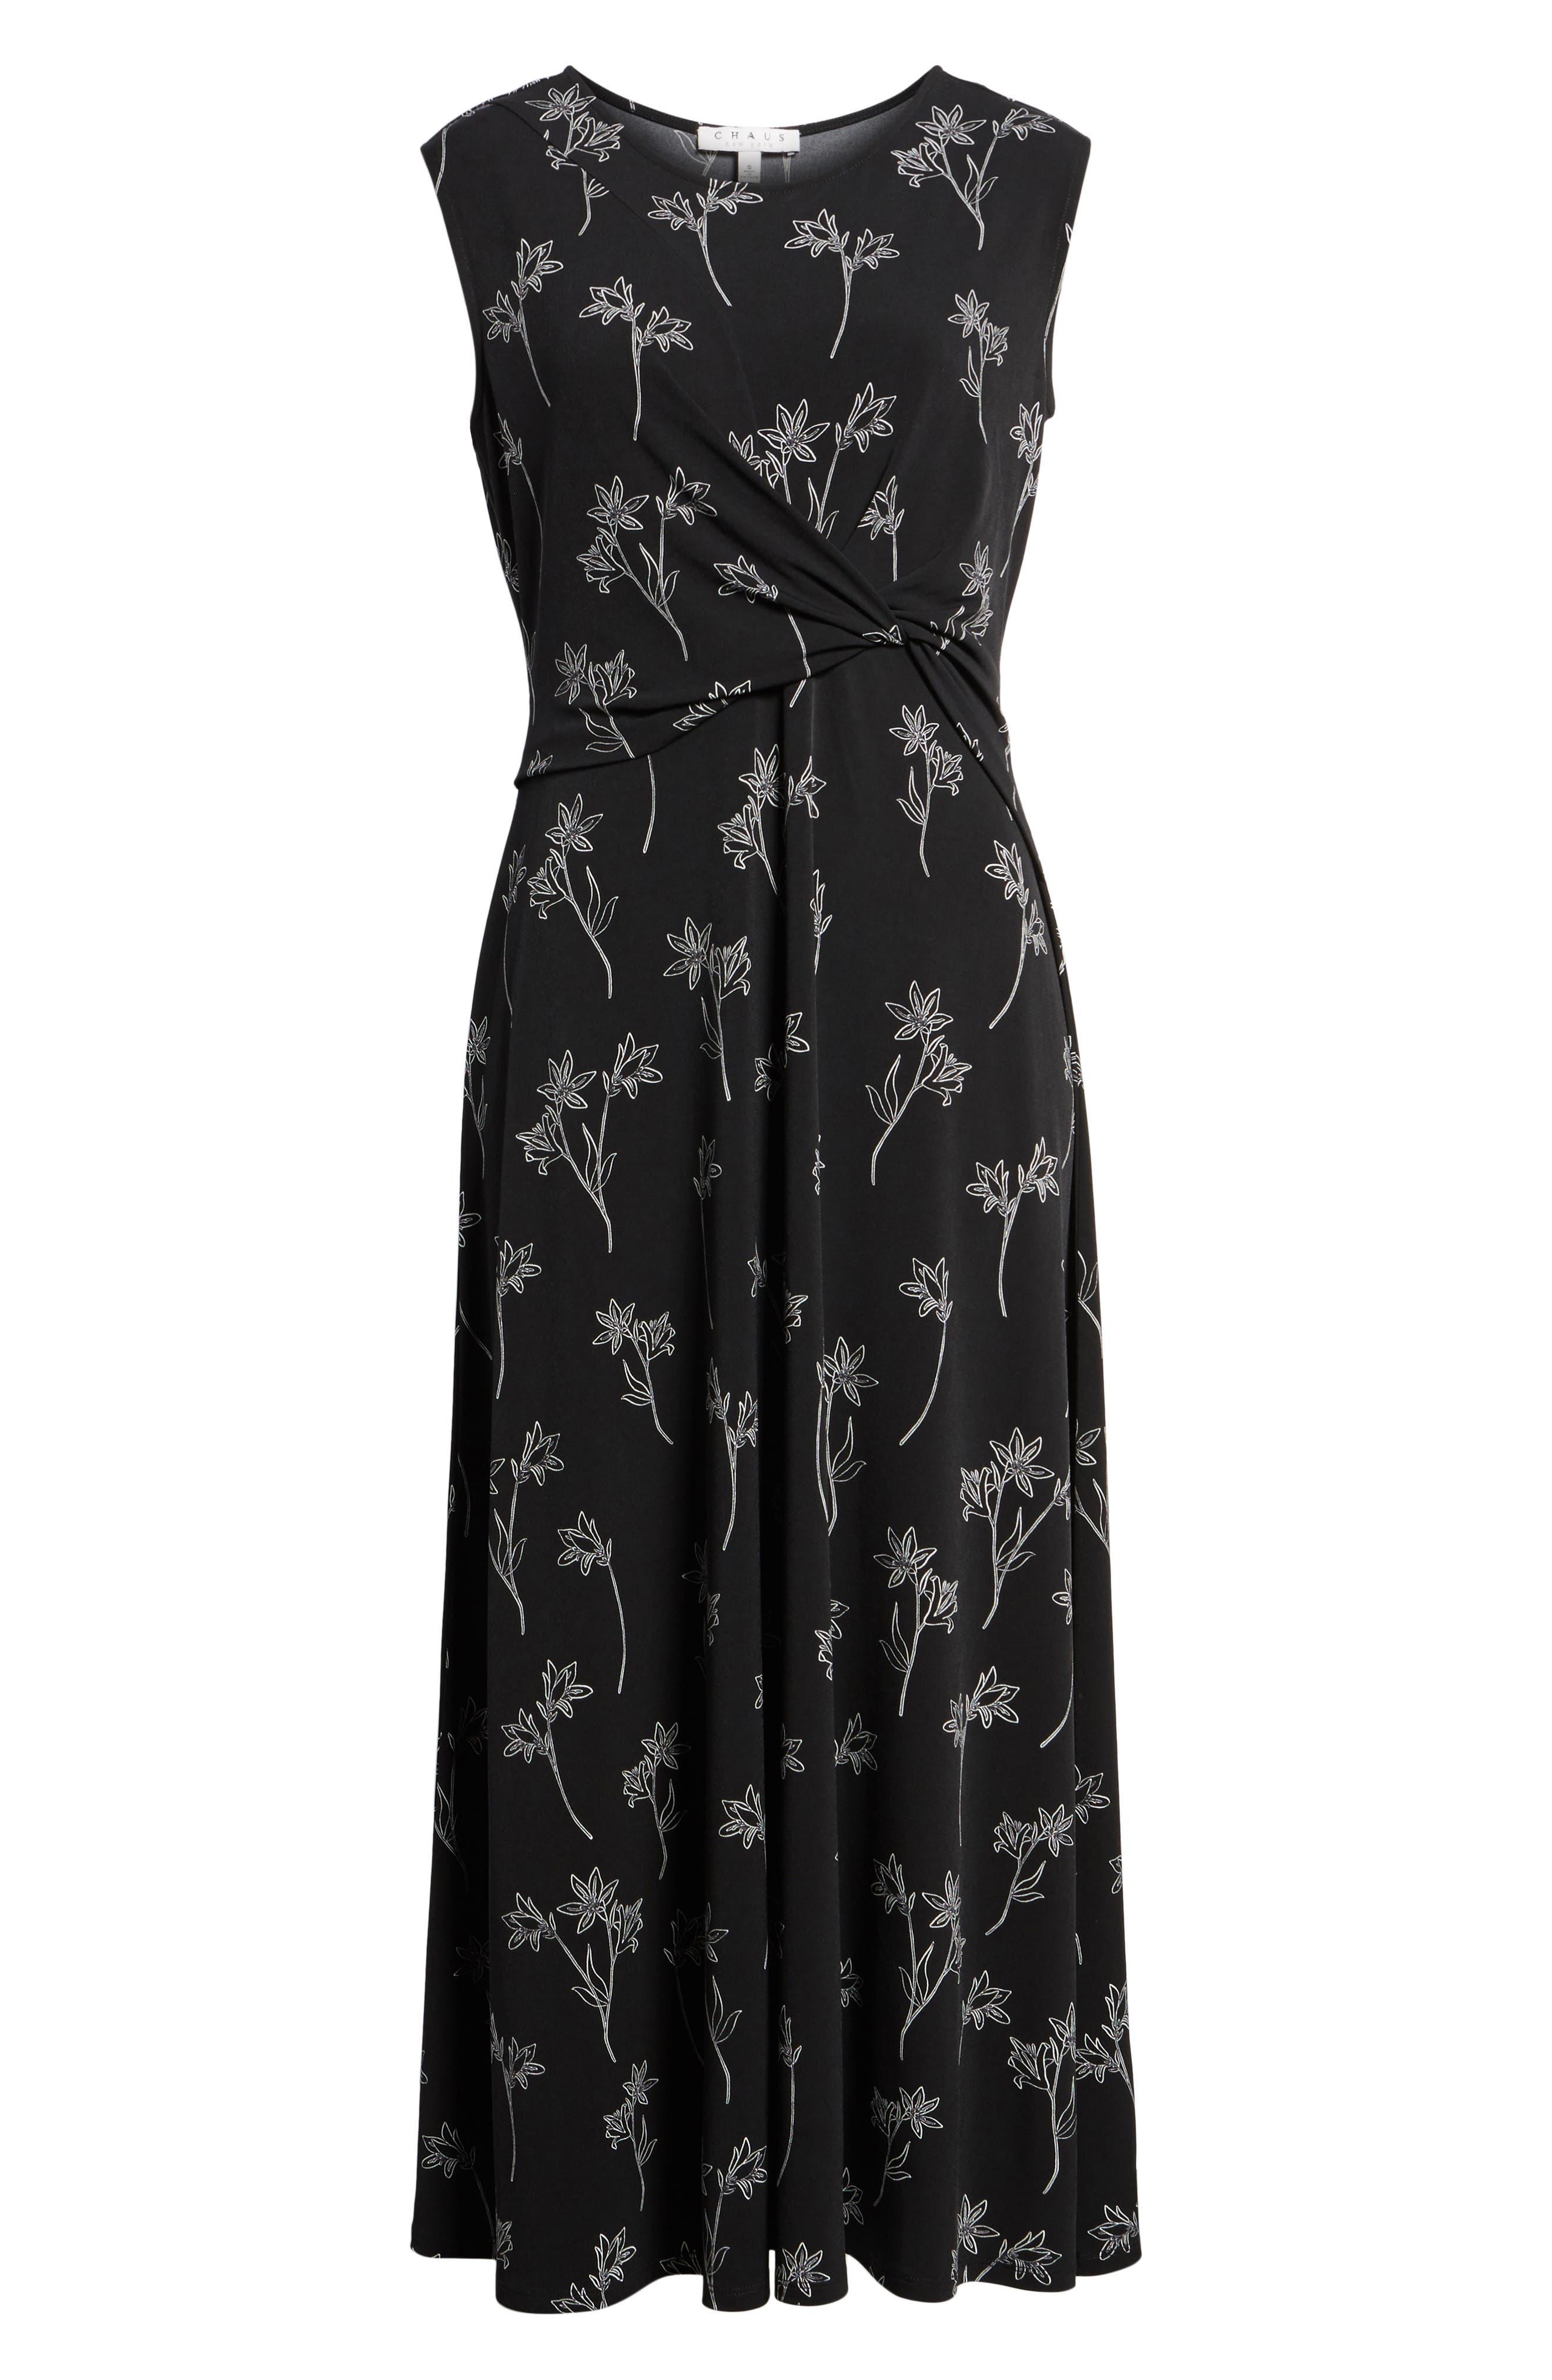 Floral Outlines Knot Front Maxi Dress,                             Alternate thumbnail 6, color,                             060-Rich Black